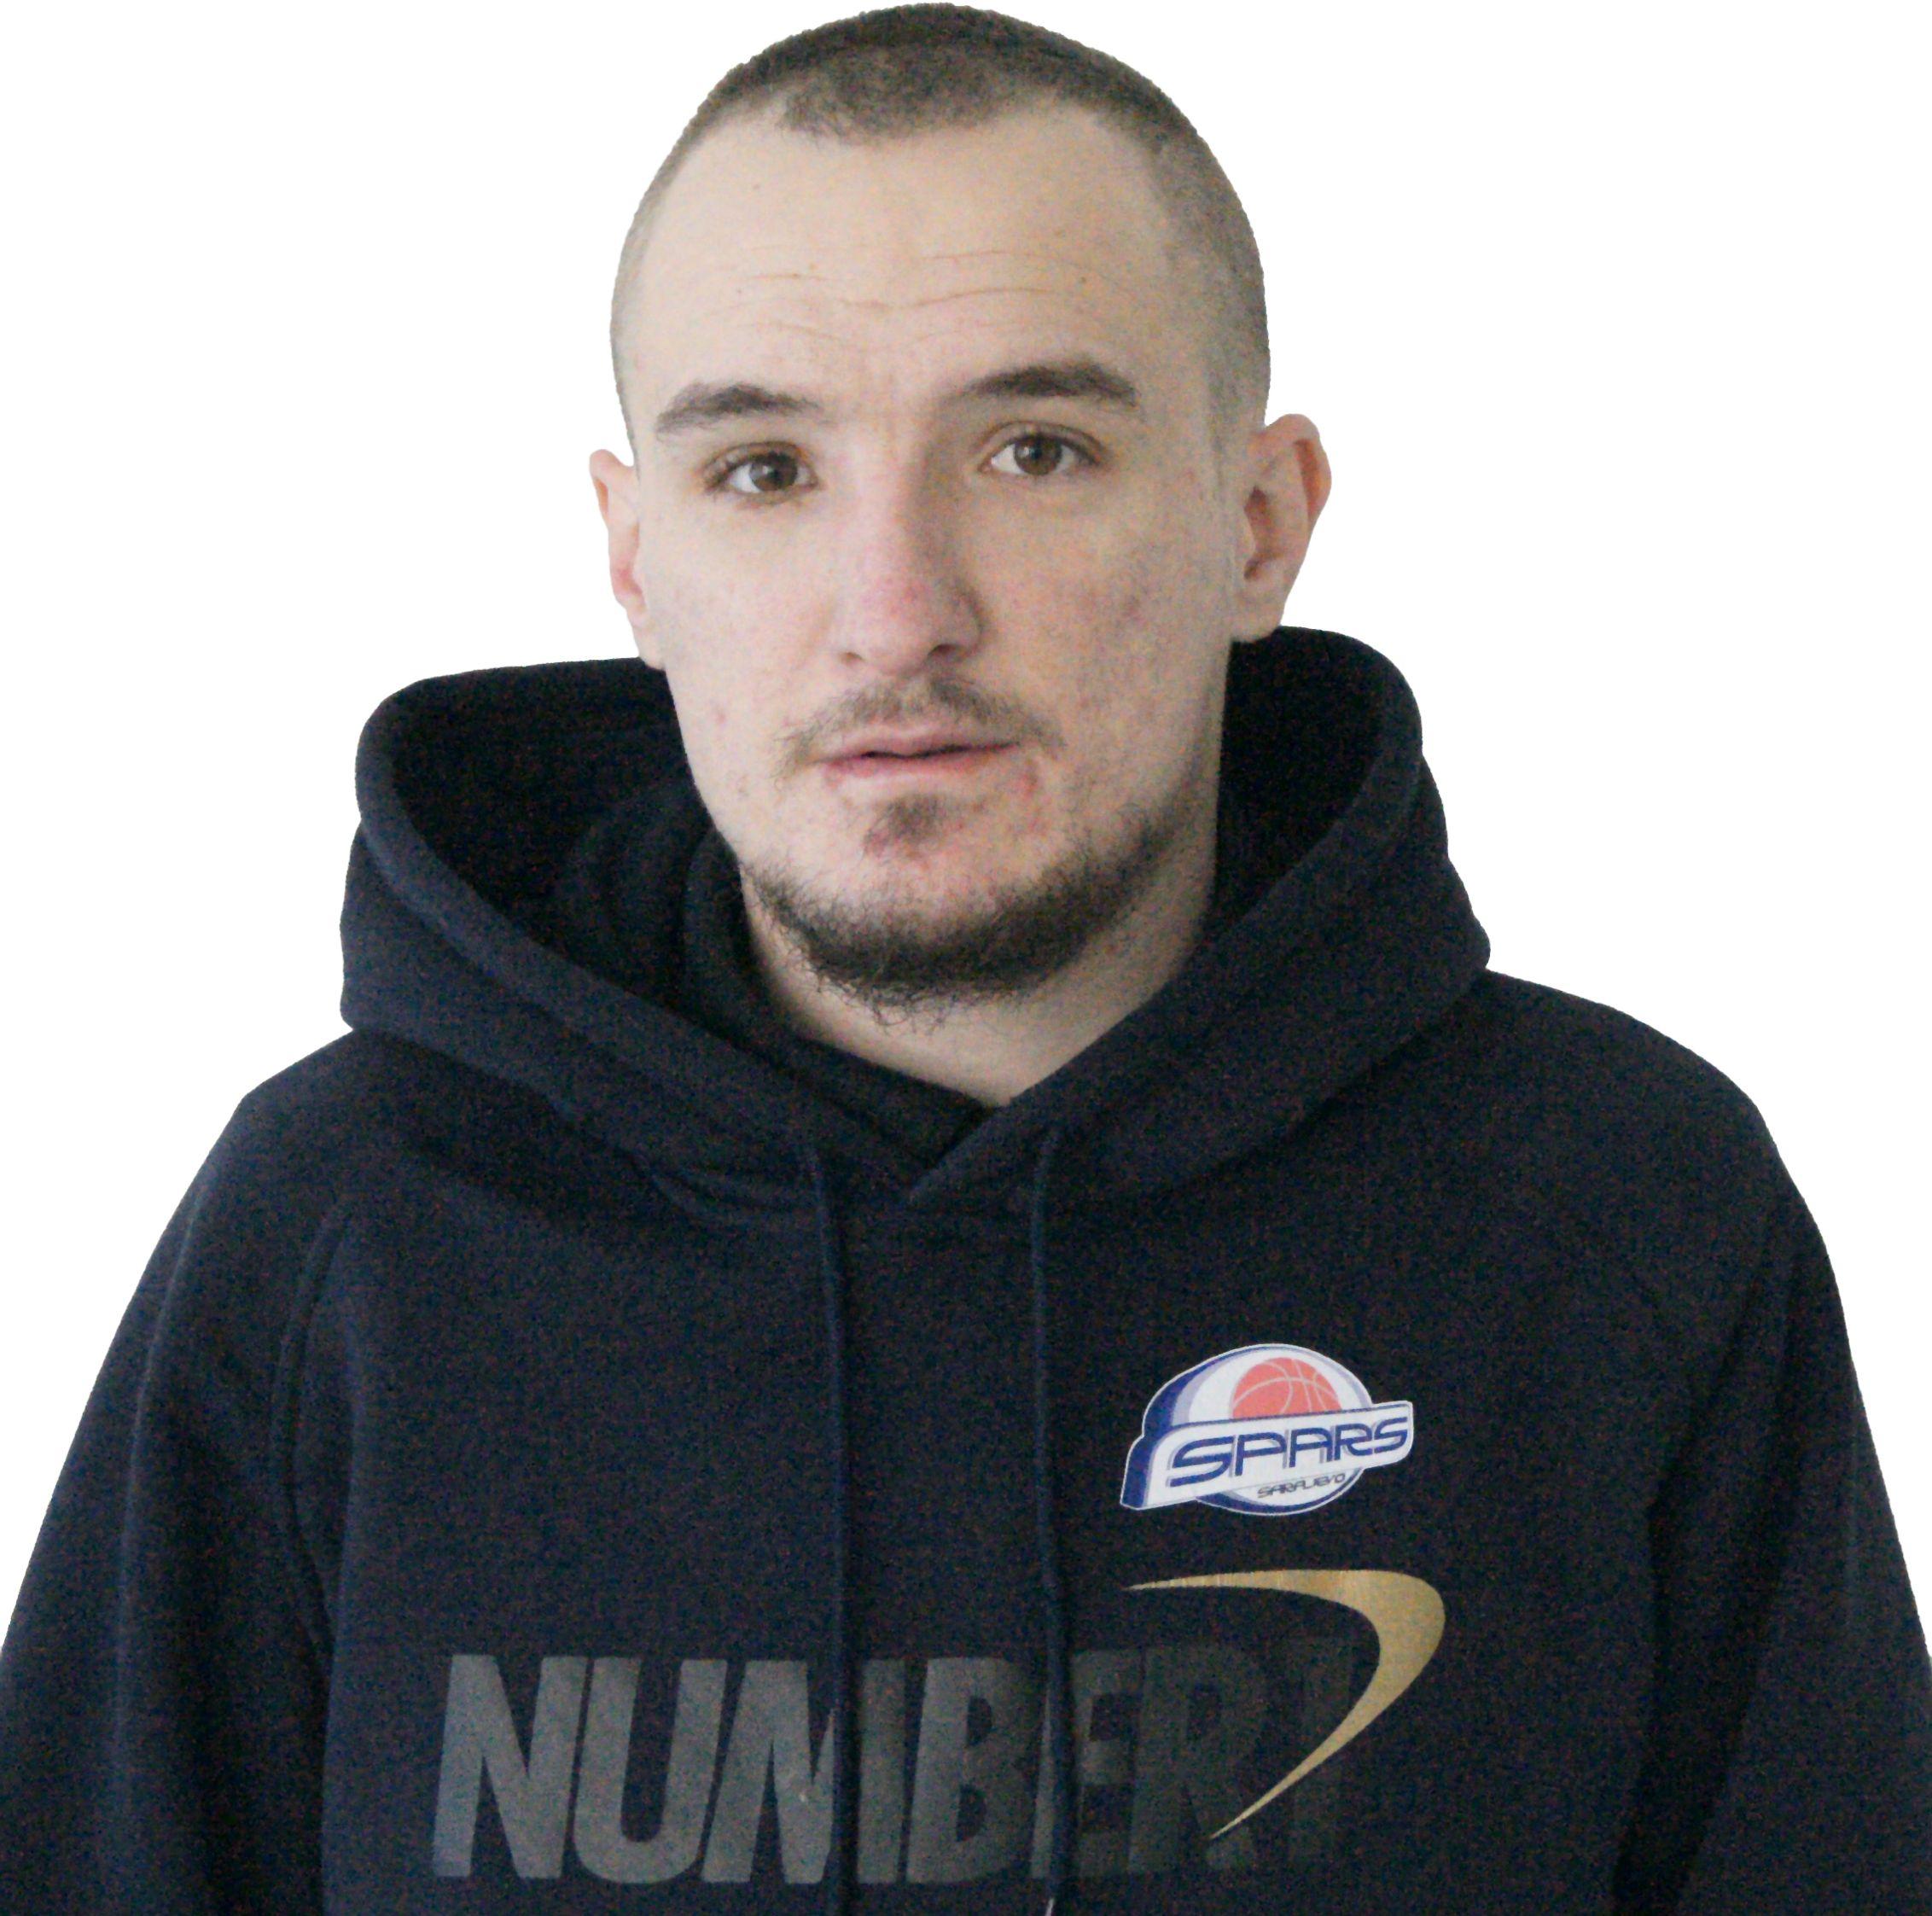 https://kkspars.com/web/wp-content/uploads/2021/09/Semir-Mulaosmnovic-1.jpg